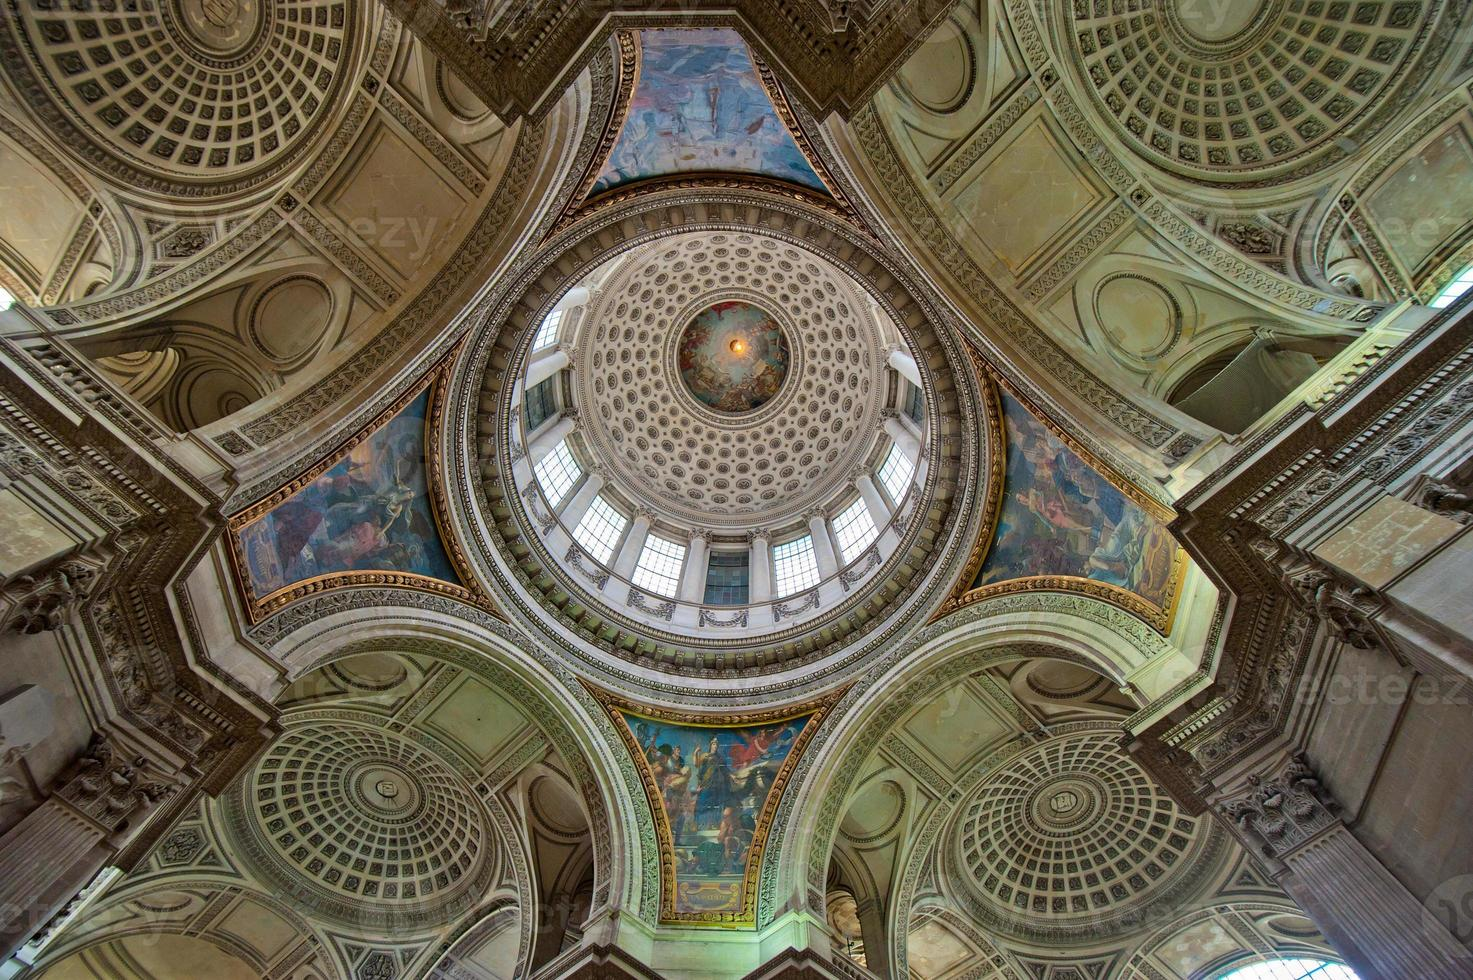 Dome of Pantheon, Paris, France photo